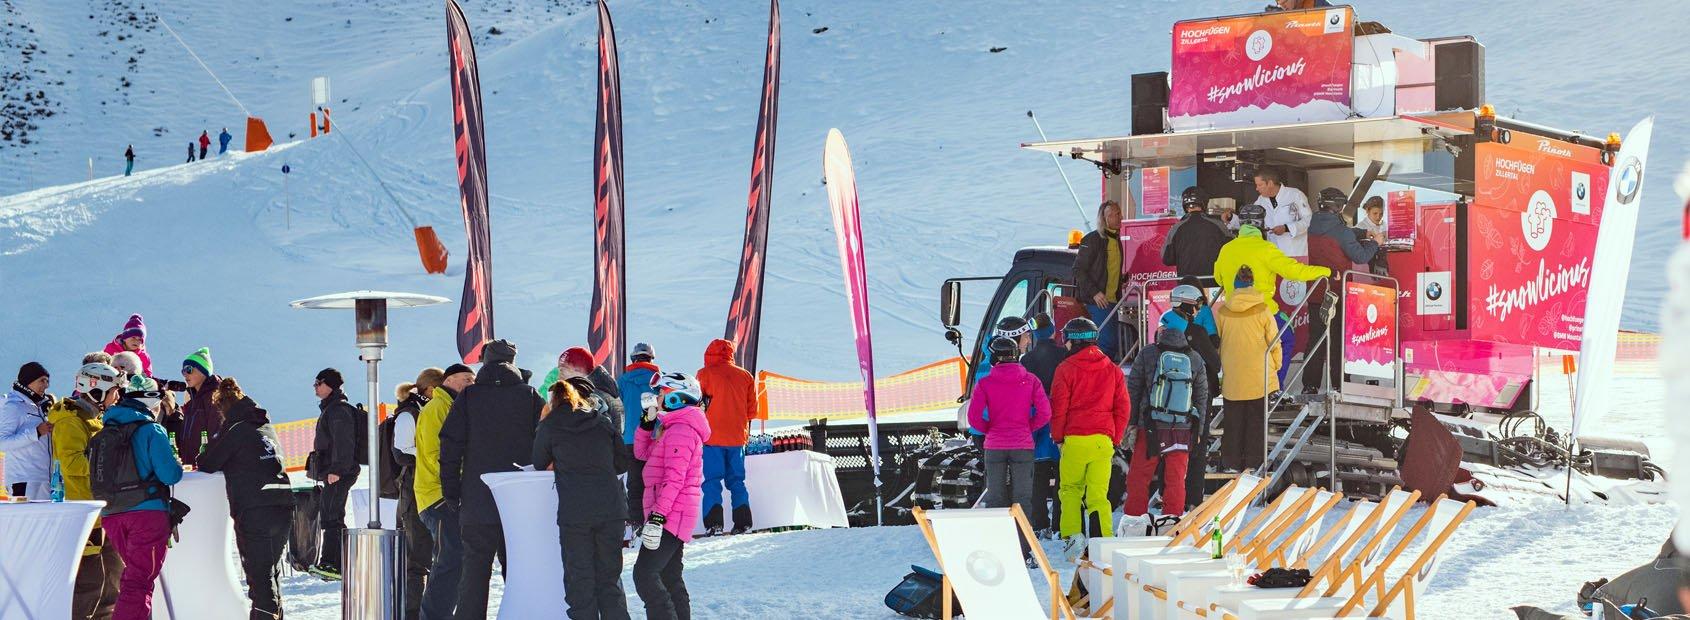 Snowlicious Après-Ski DJ on Top Haubenküche